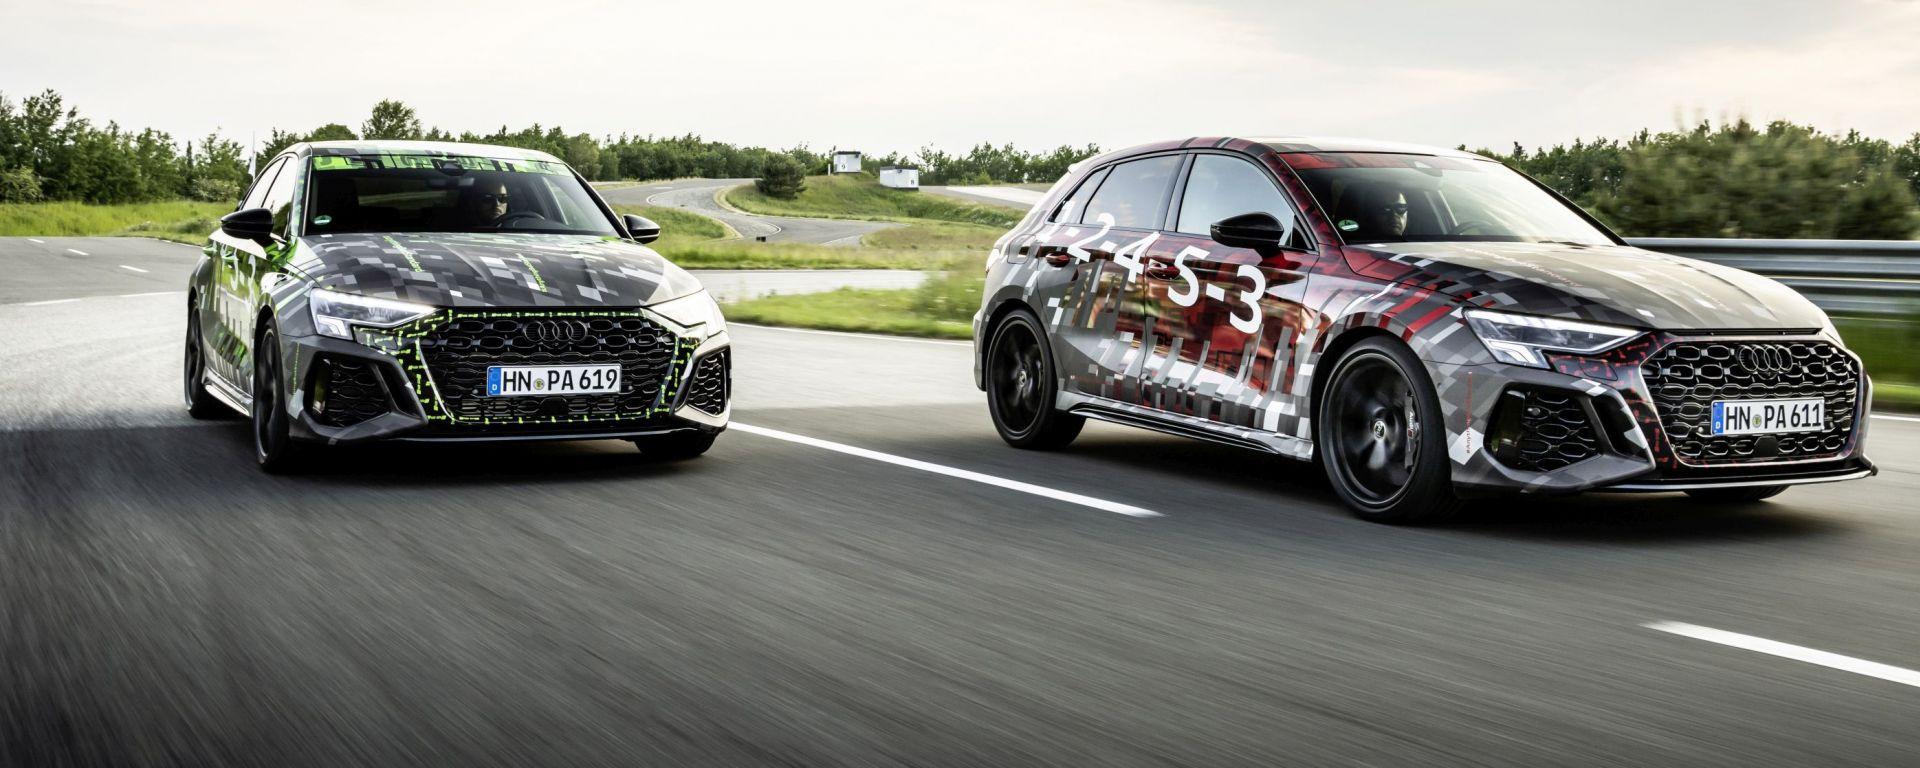 Nuove Audi RS3 Sportback e Sedan con RS Torque Splitter